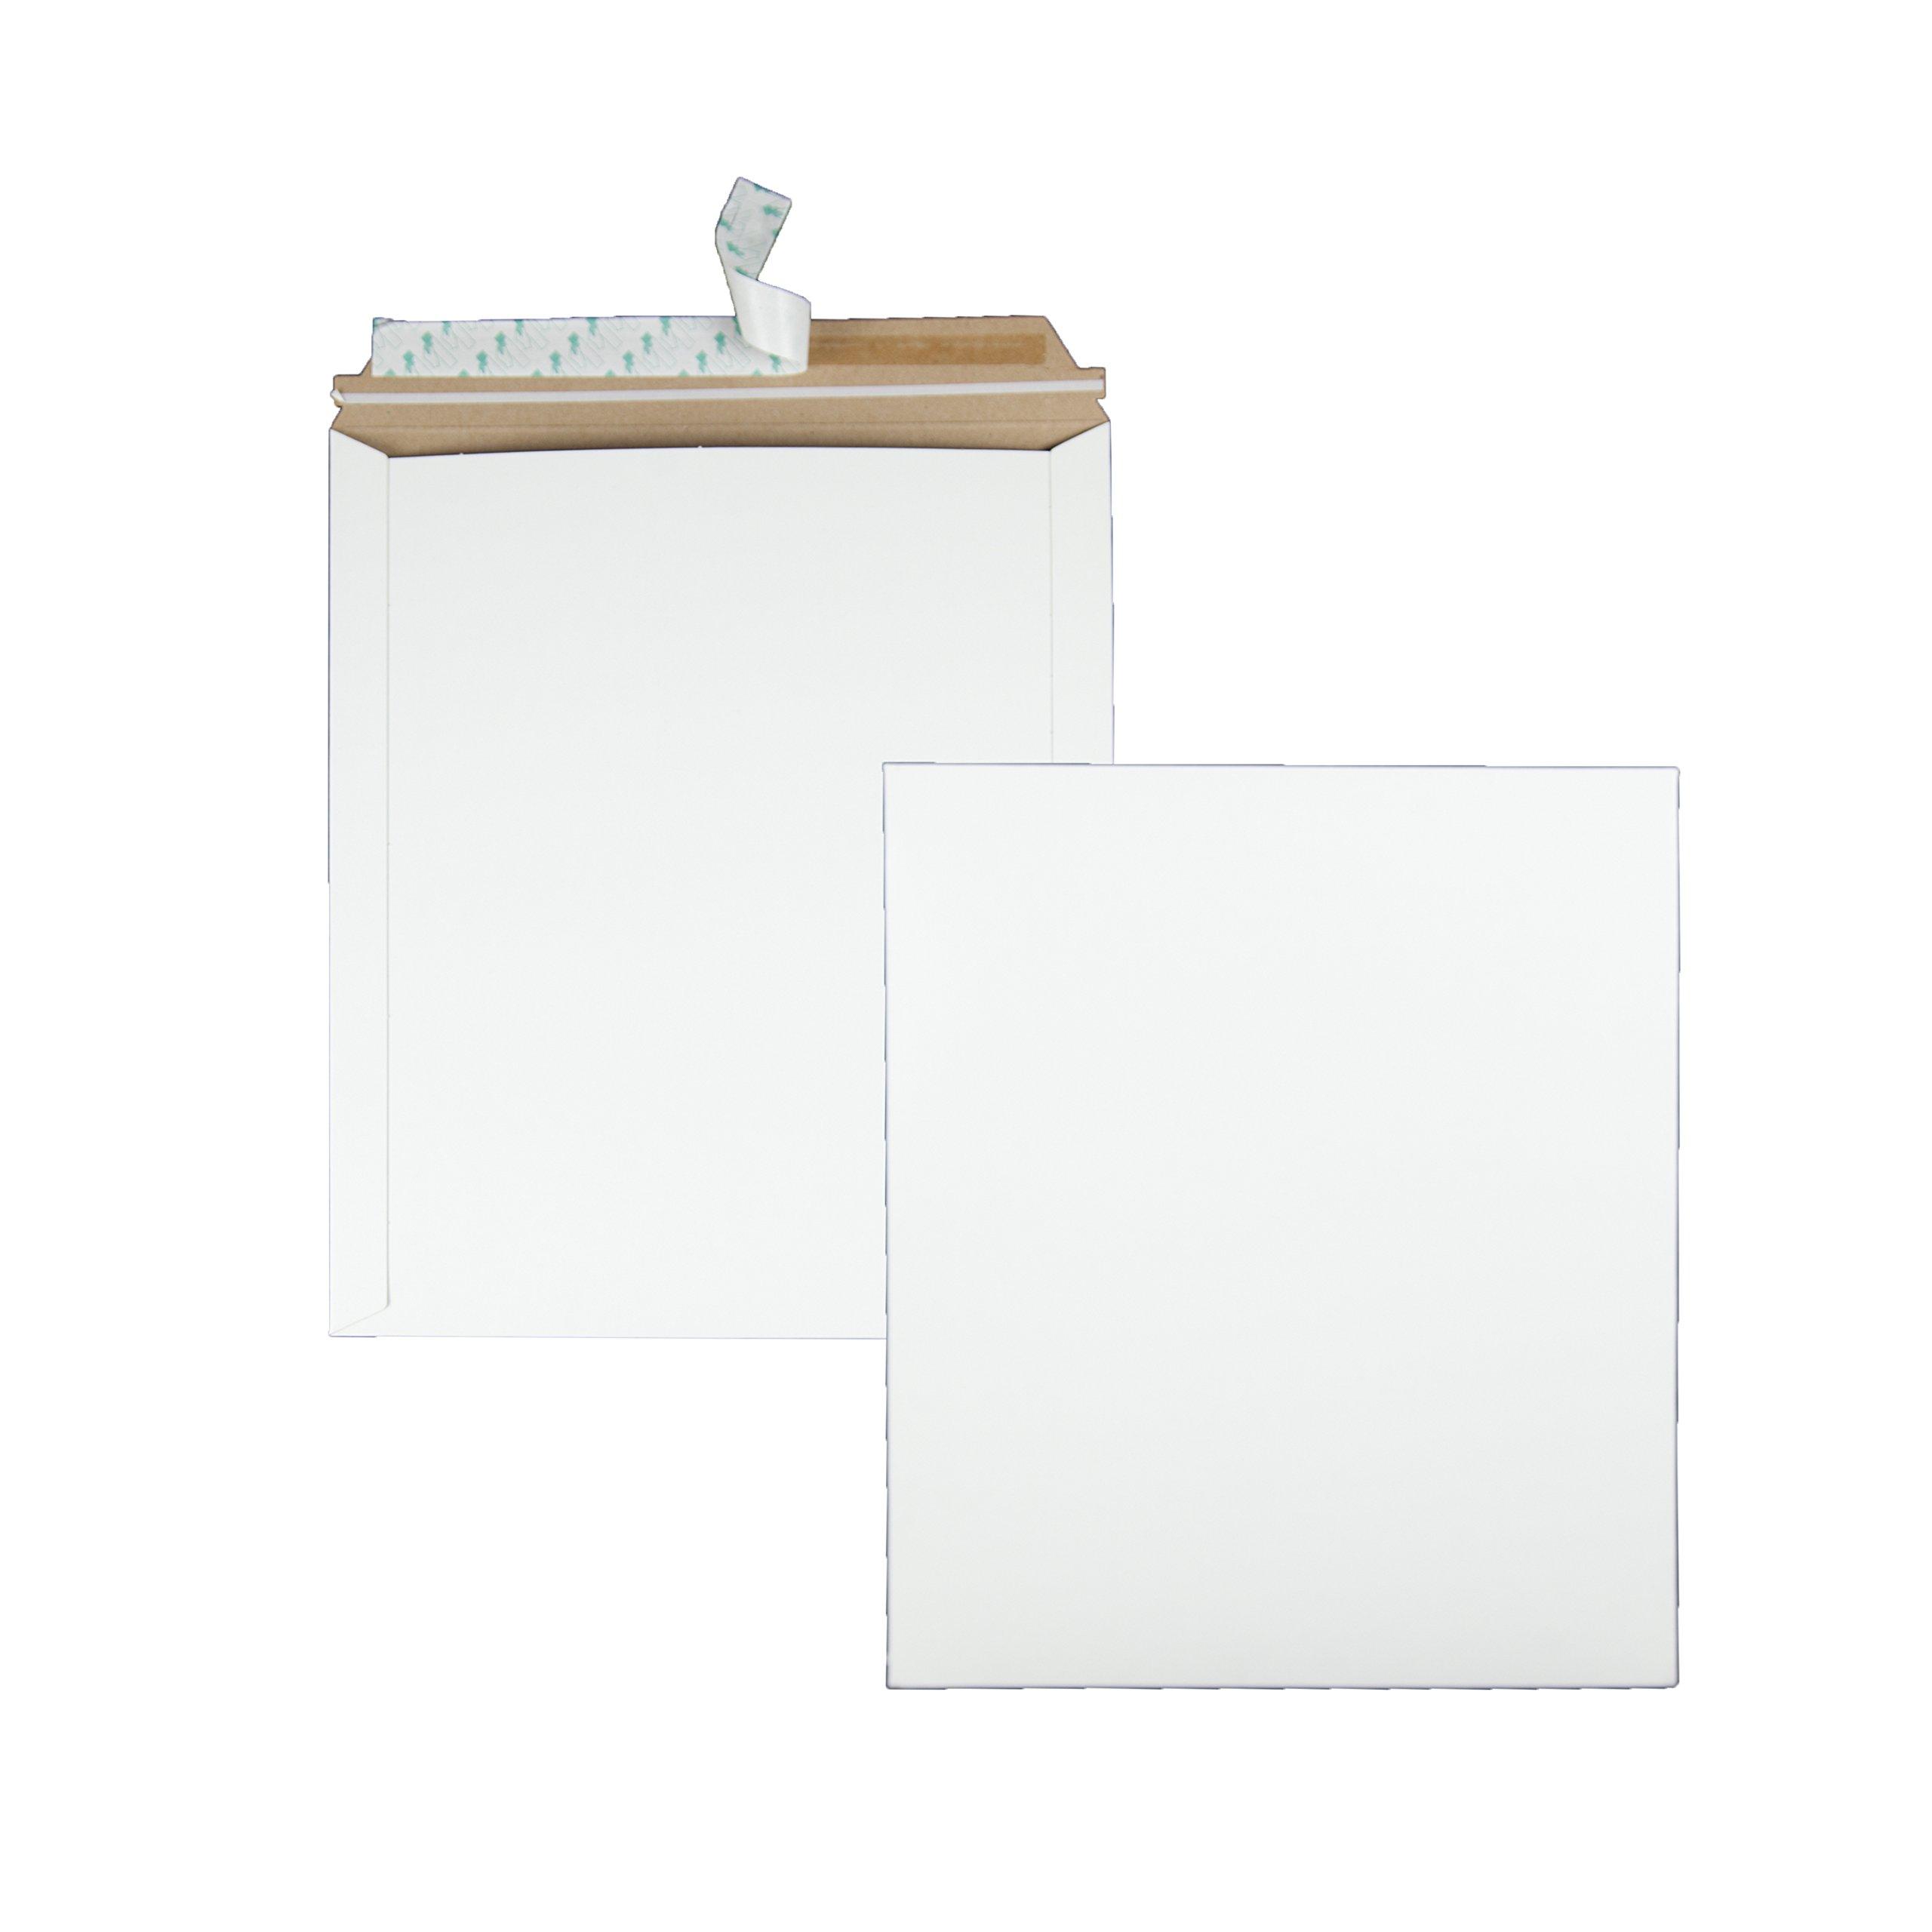 Quality Park Extra-Rigid Fiberboard Photo Document Mailers, Redi-Strip, White, 12.75x15, 25 per box (64019) by Quality Park (Image #1)